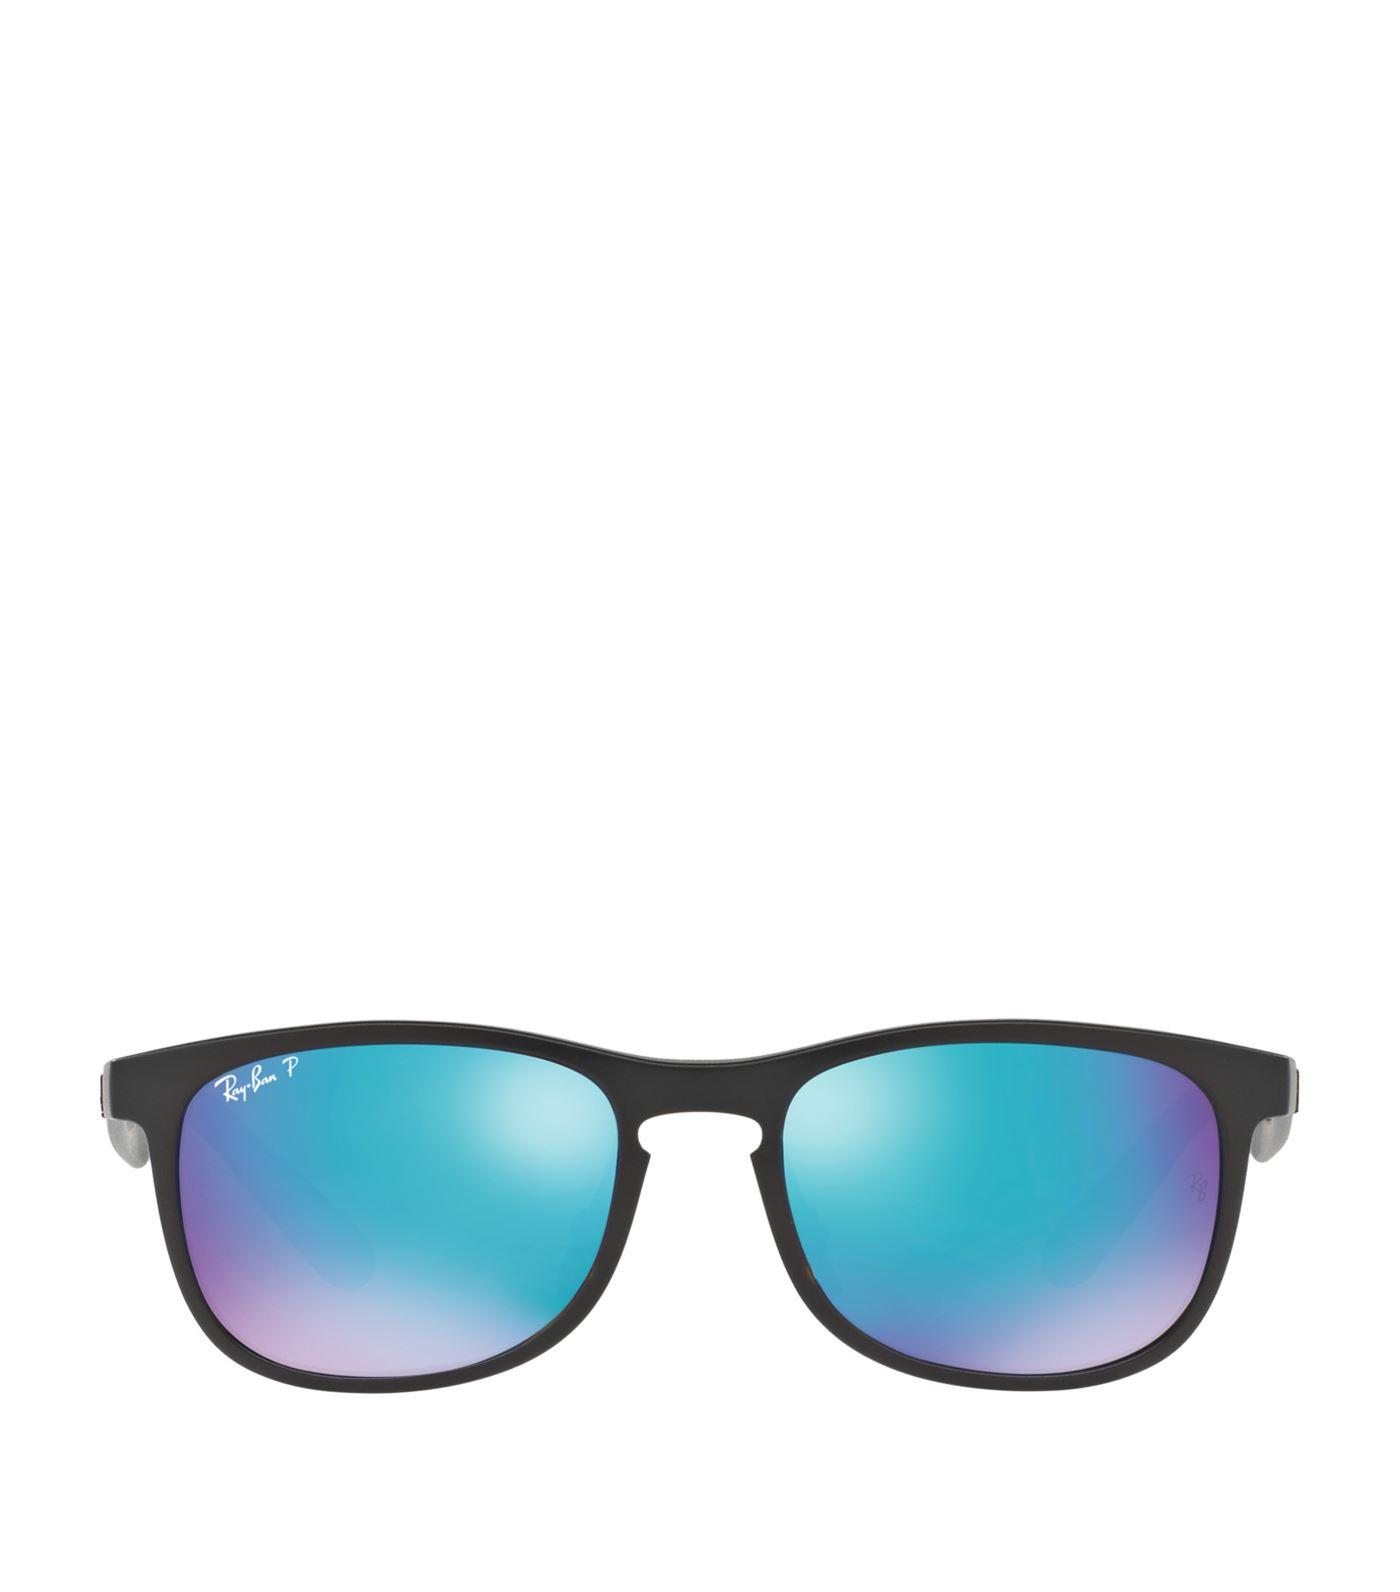 12f57f2760e Rayban Chromance Sunglasses Rb4263